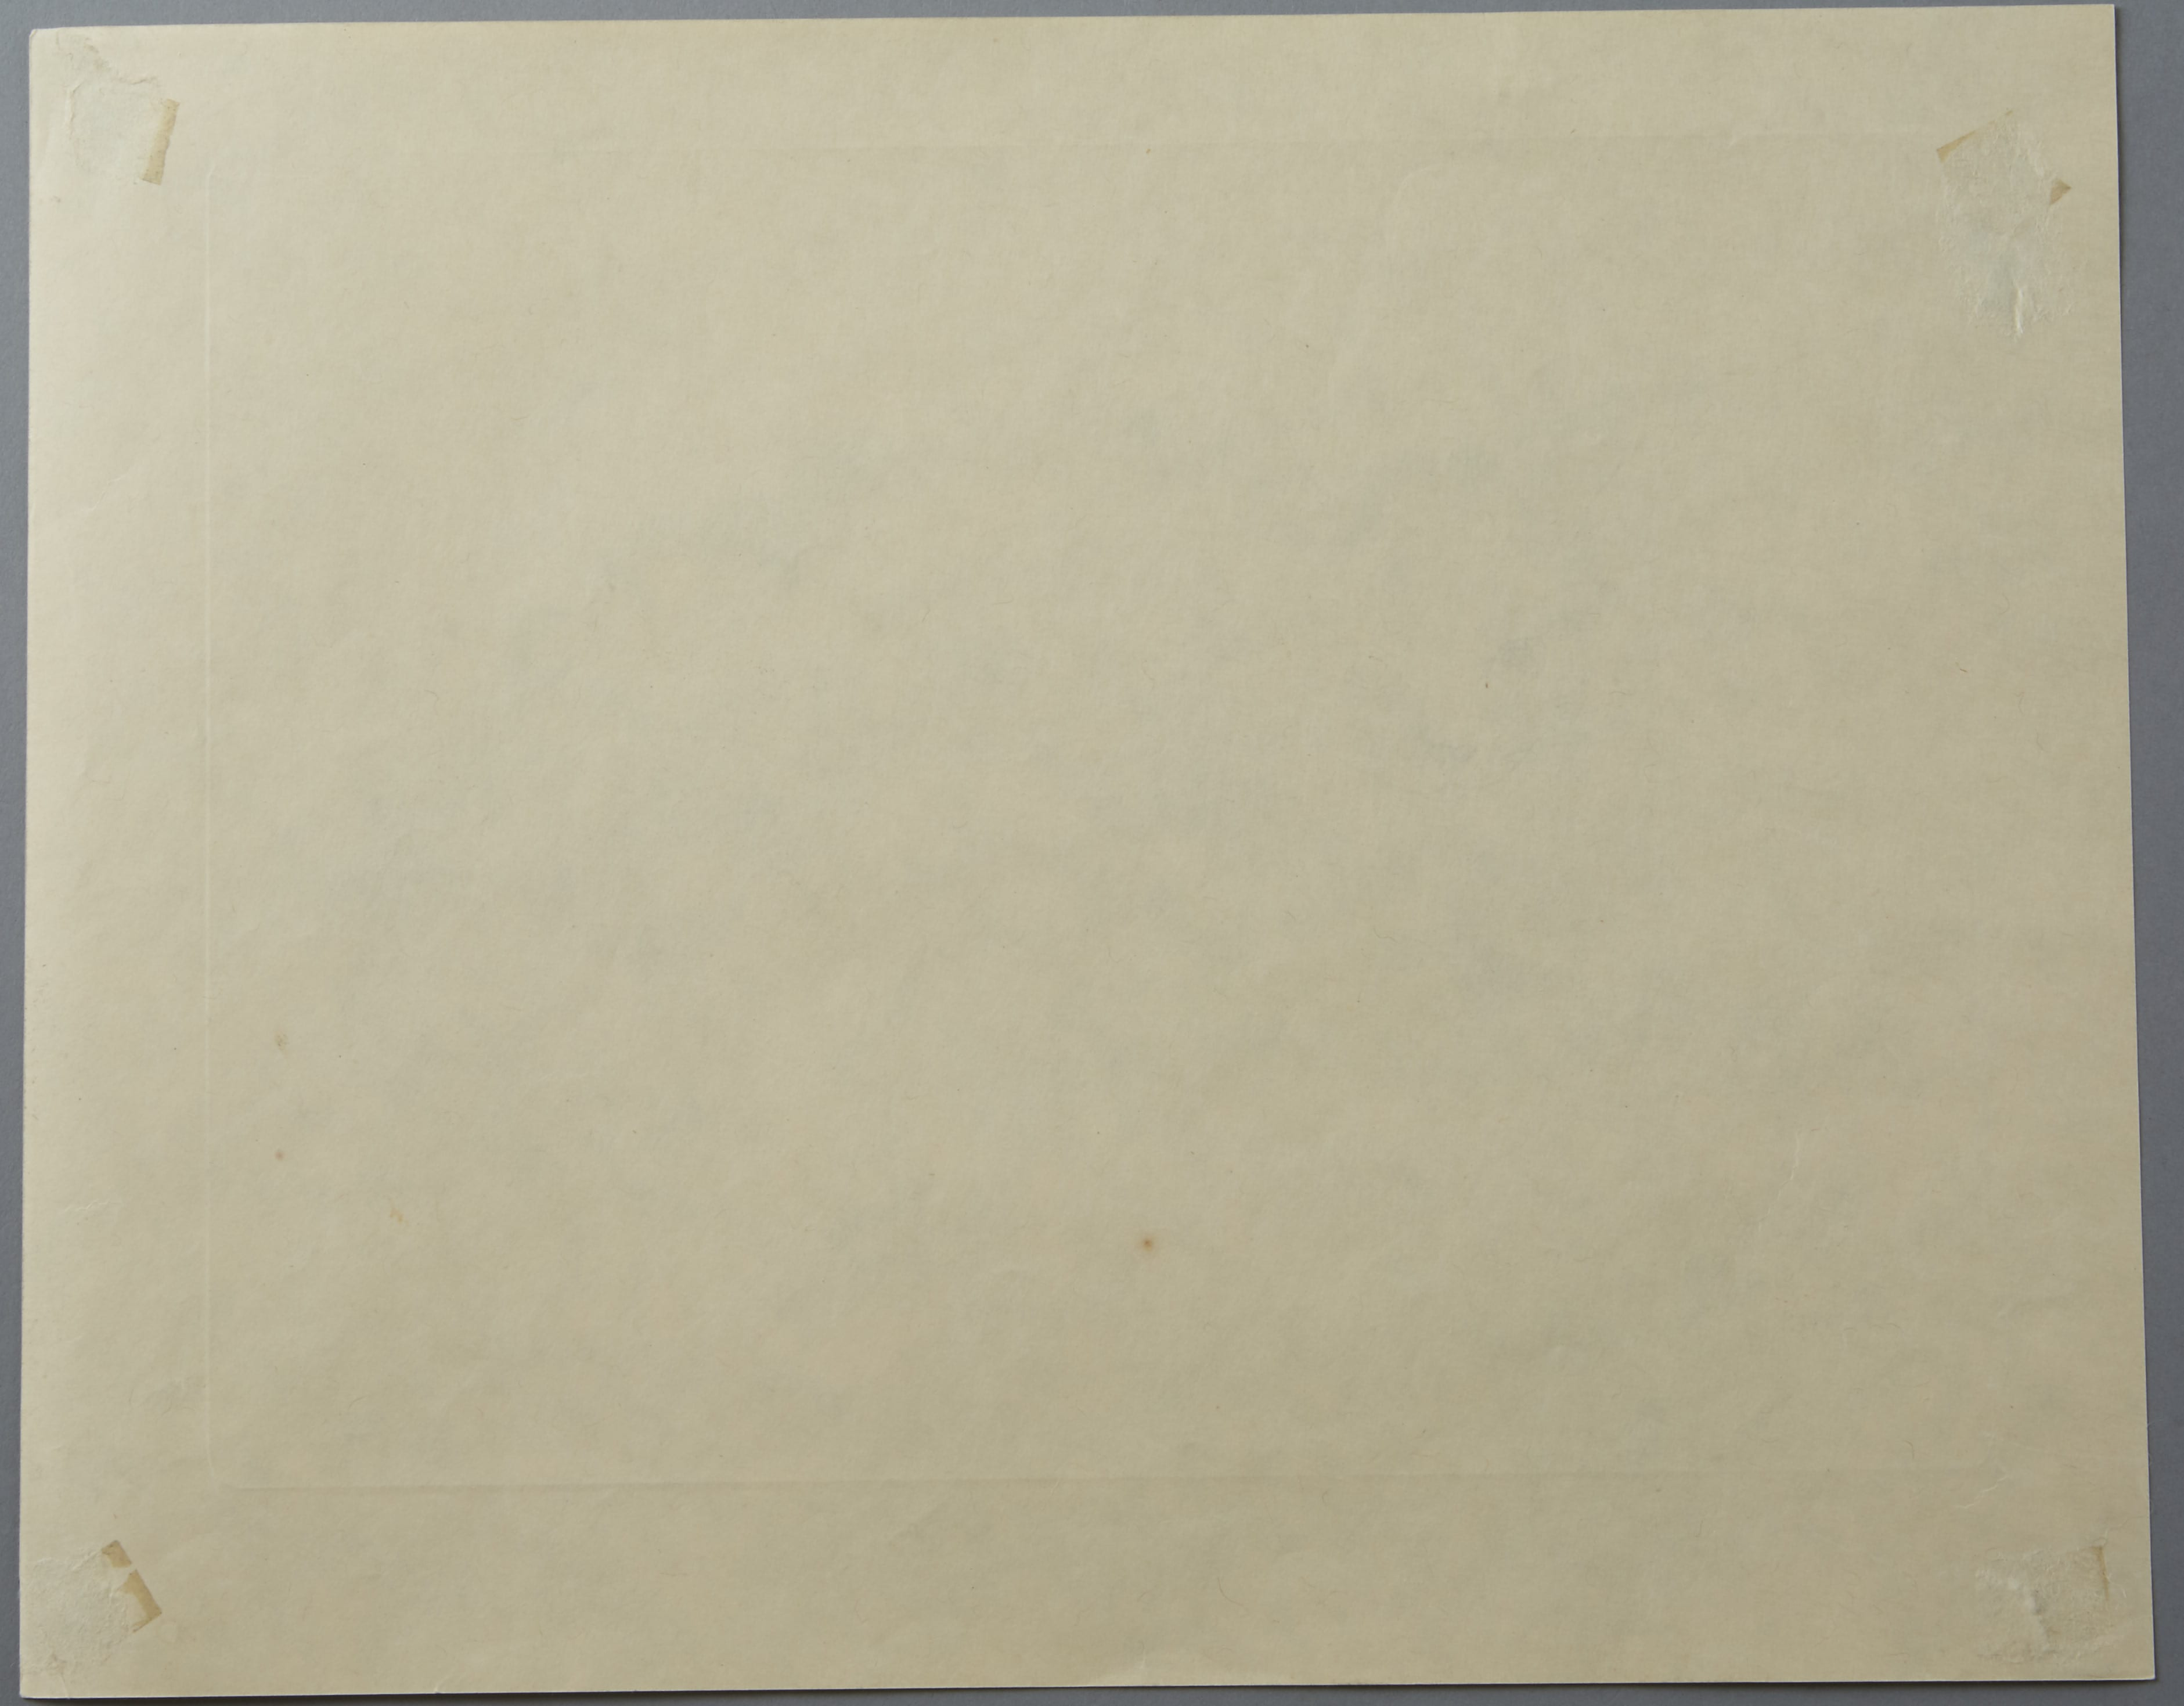 Lot 262: Leonard Tsuguharu Foujita Hand-Signed Collotype Print Book of Cats